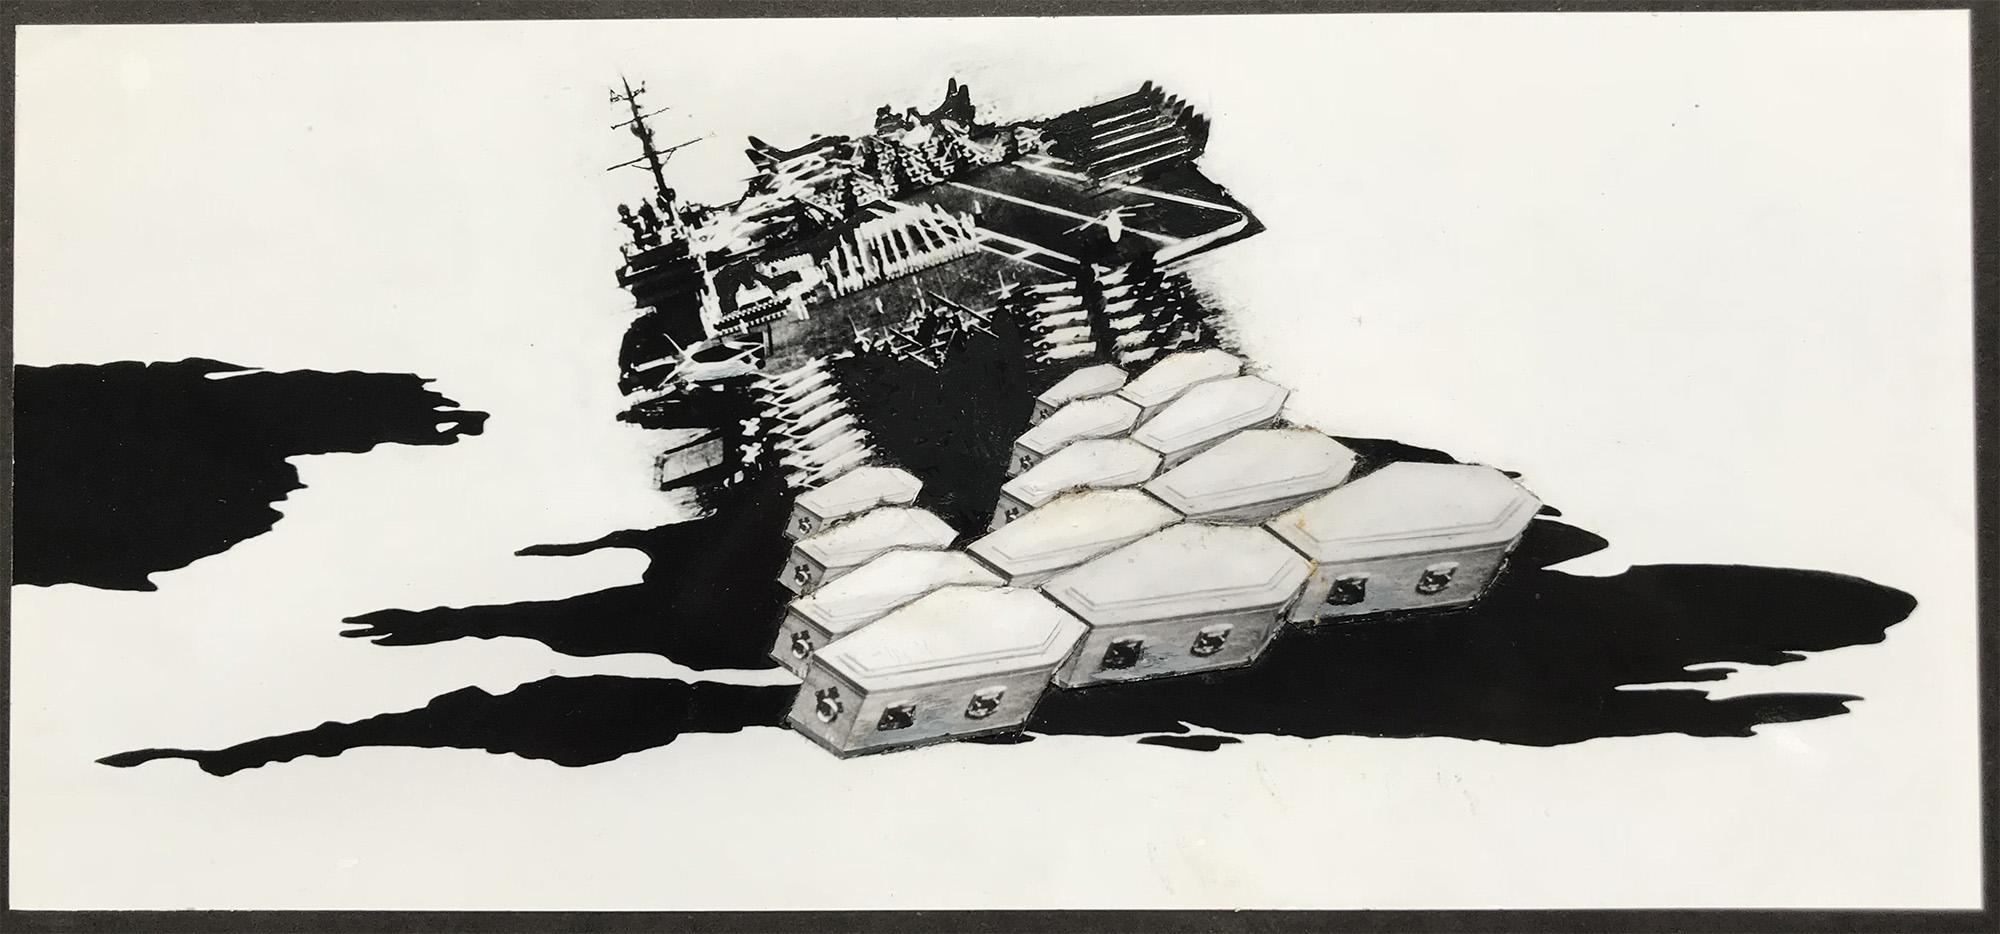 Falklands War - PhotomontageGelatin silver print on card1981First published: New Scientist, Sept 1981Catalogue: PK/150